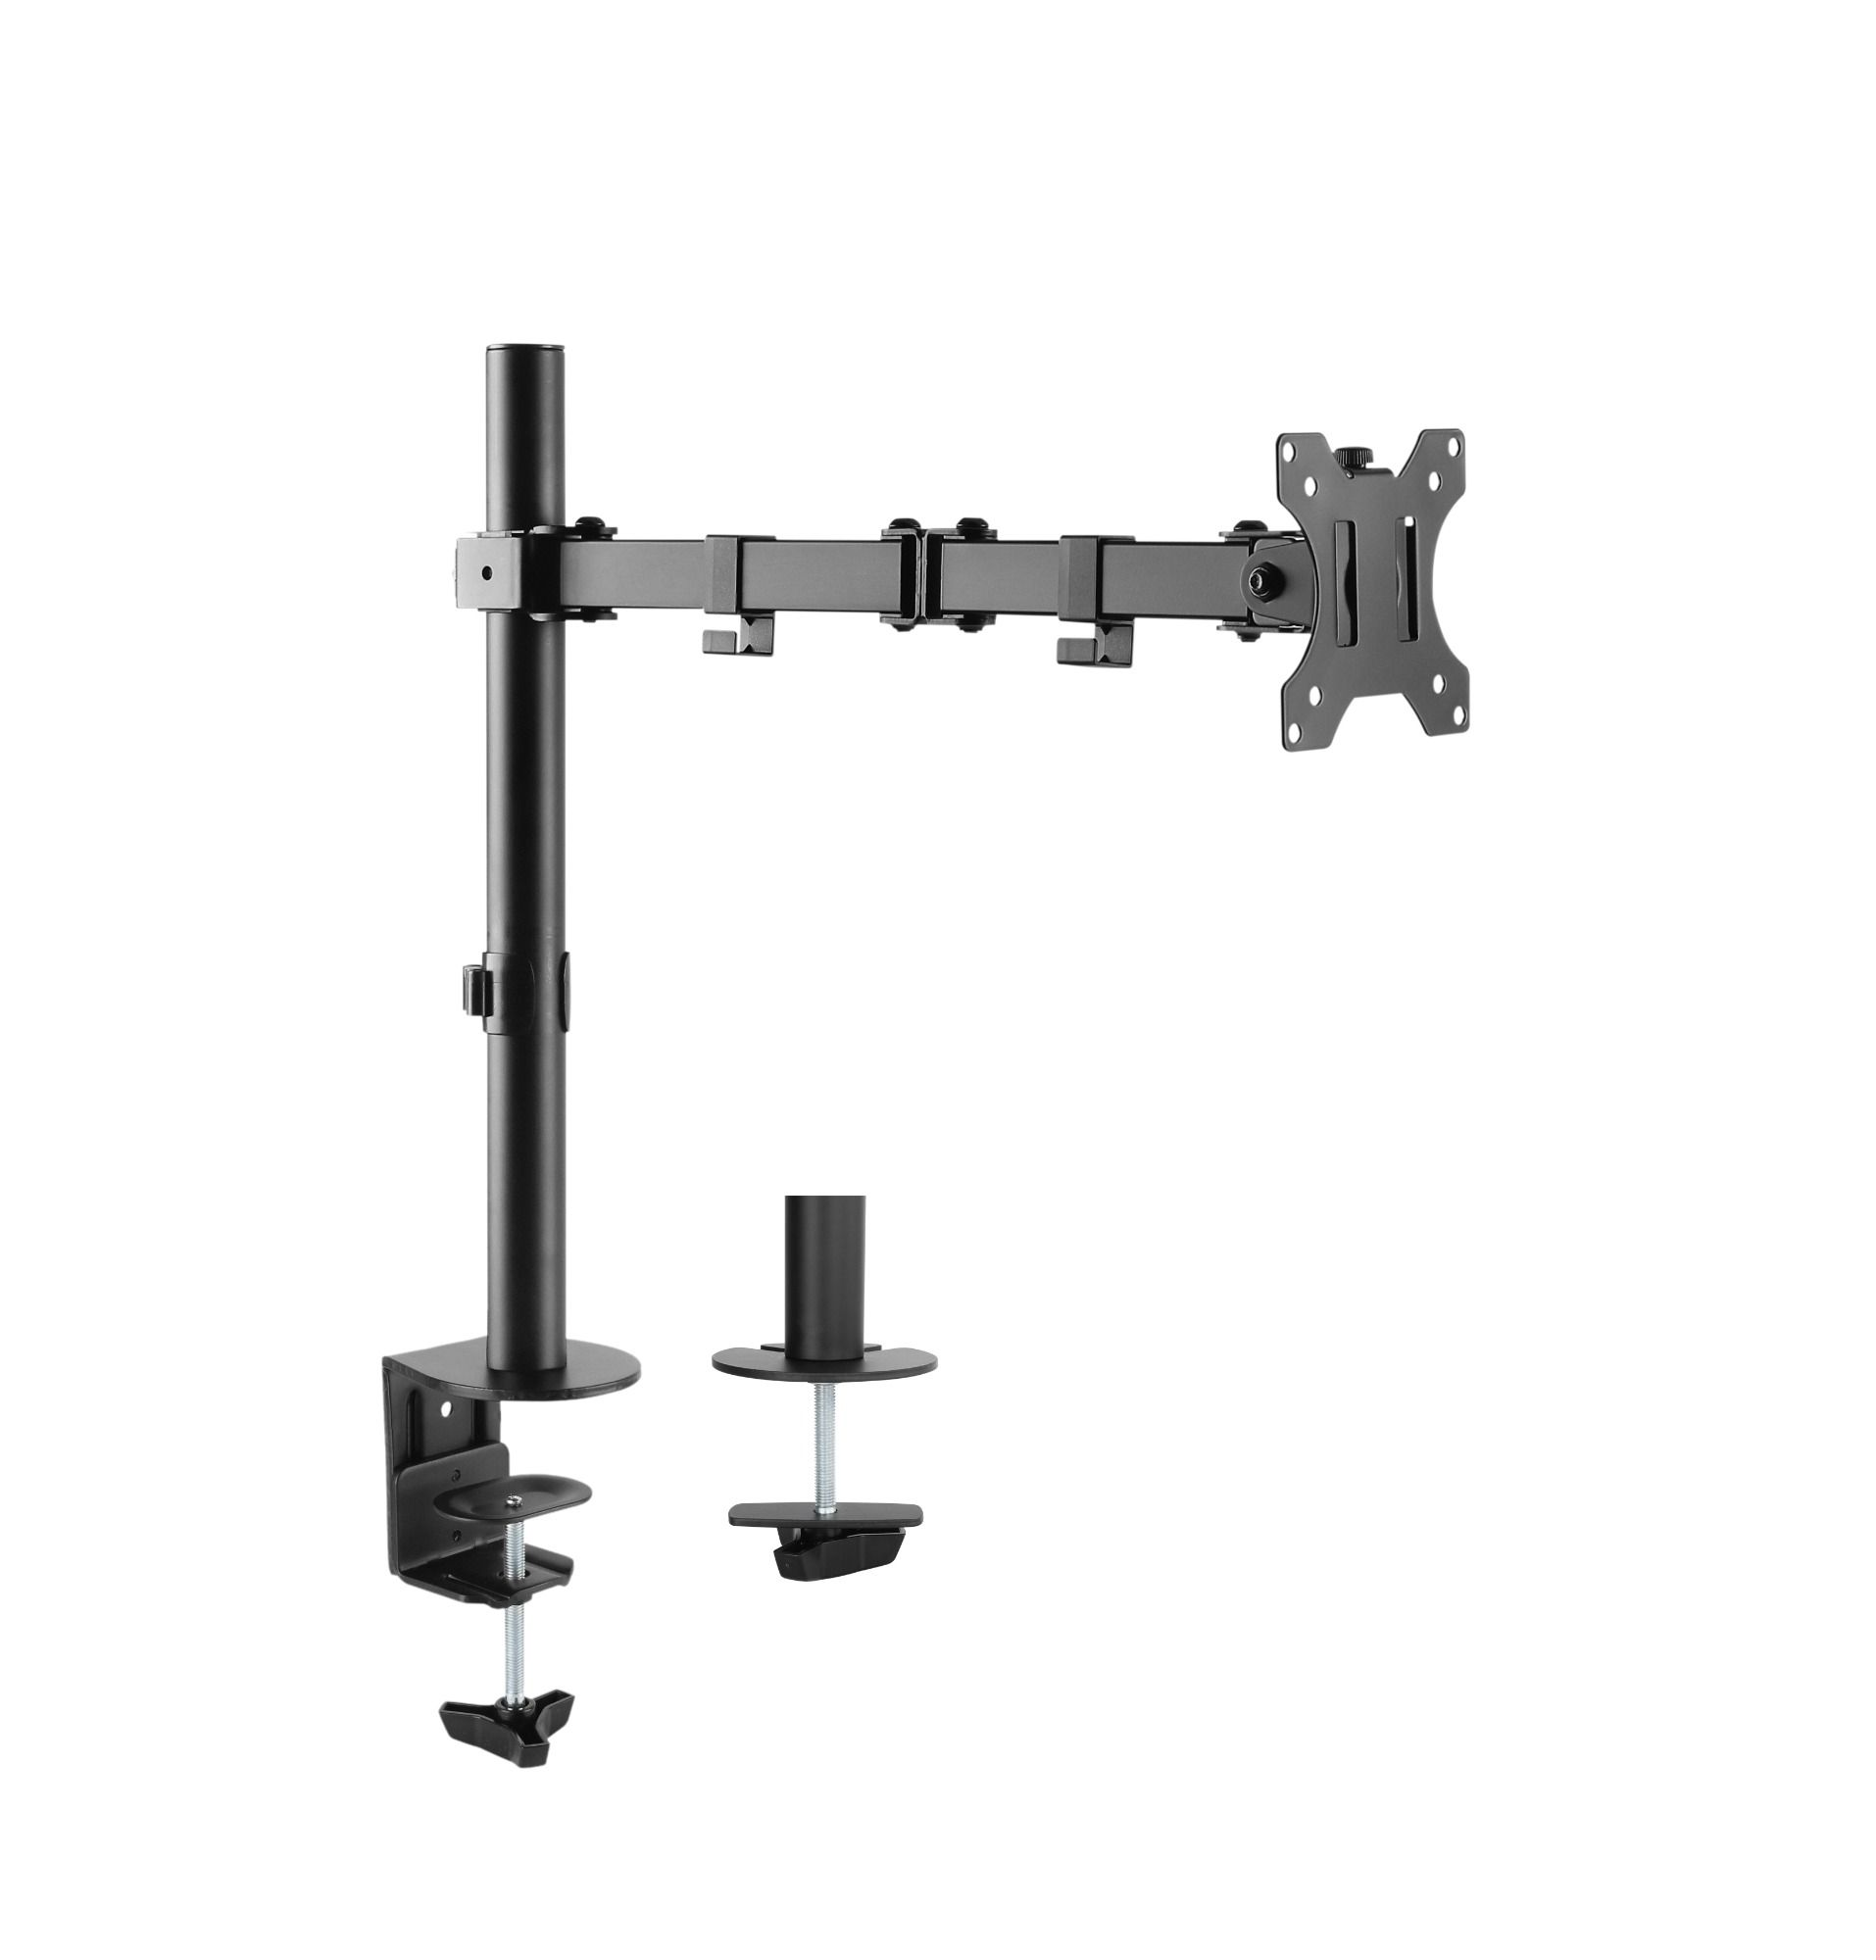 Audizio MAD10 universele monitor arm voor 13 - 32 inch scherm